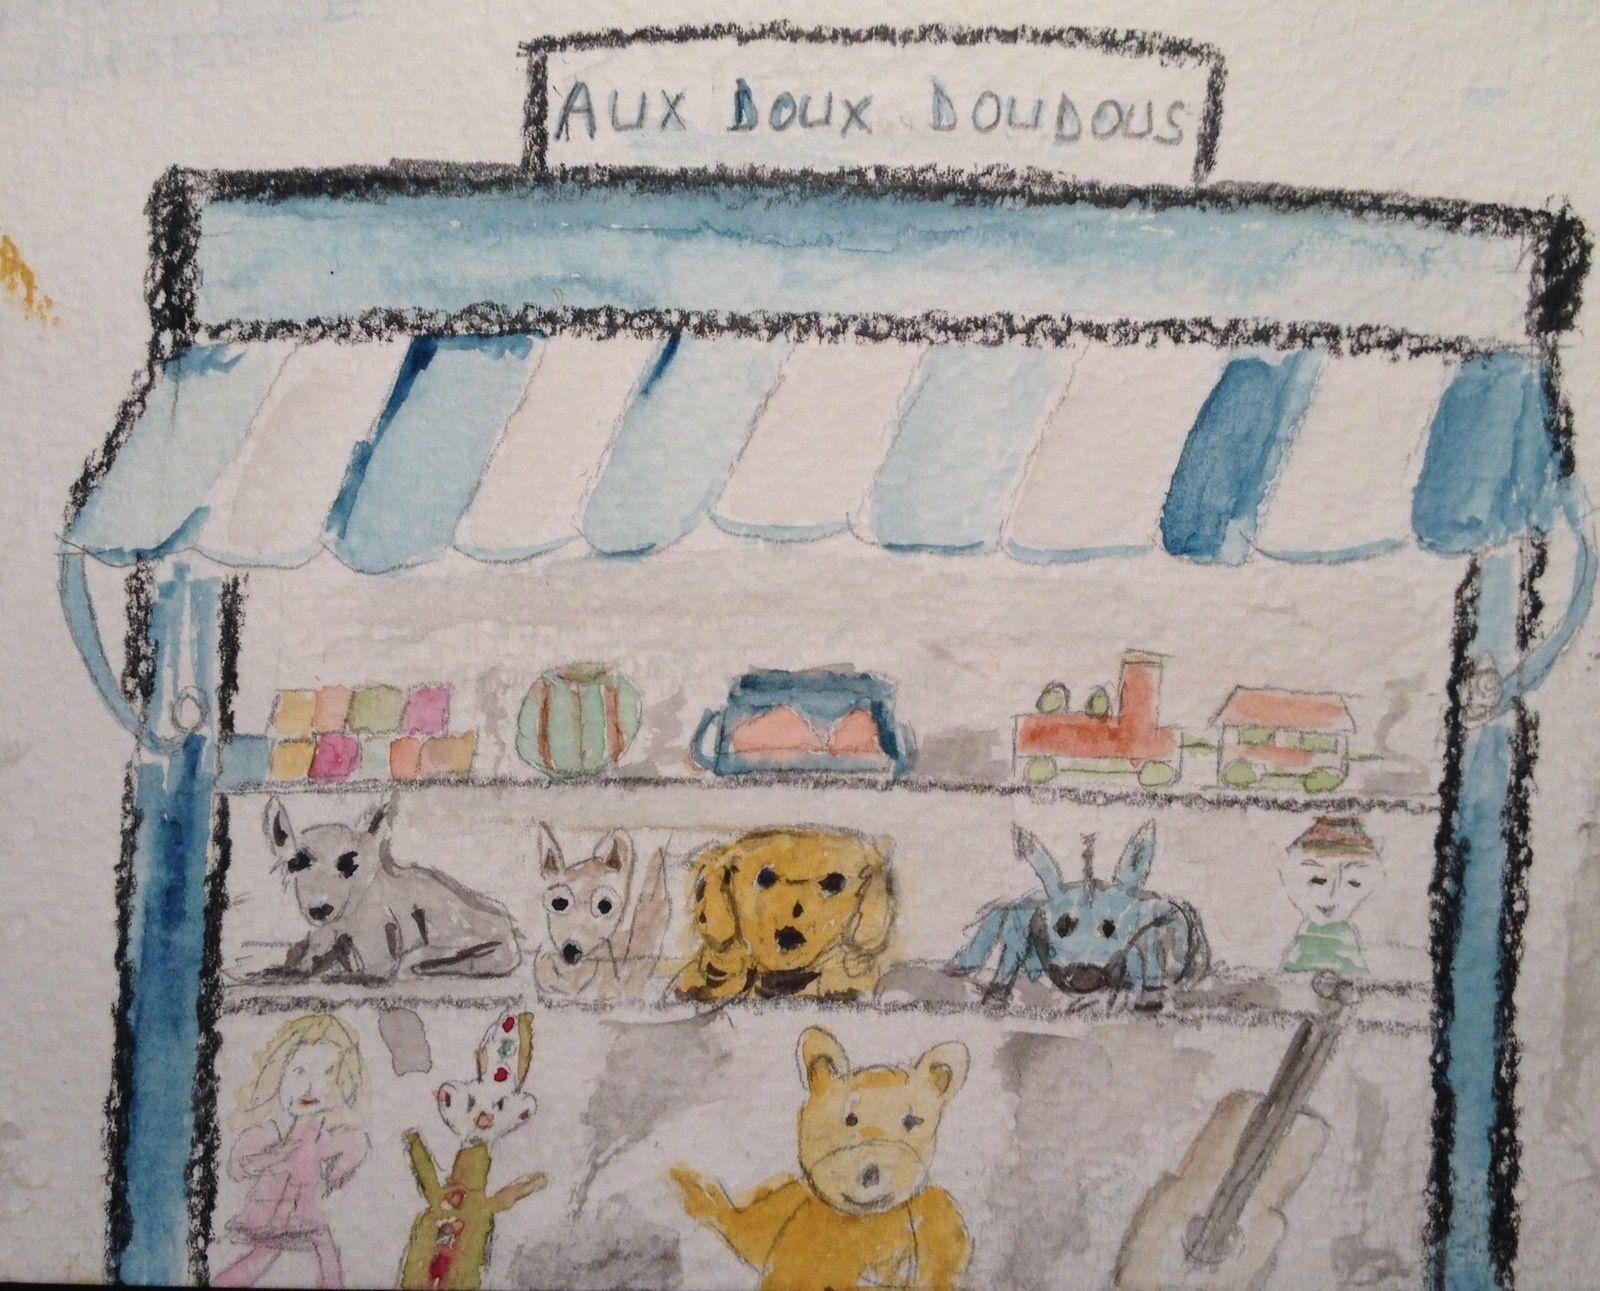 les enfants, George Sand, Maurice, Solange, Dudevant, Sand, affection, famille, enfance